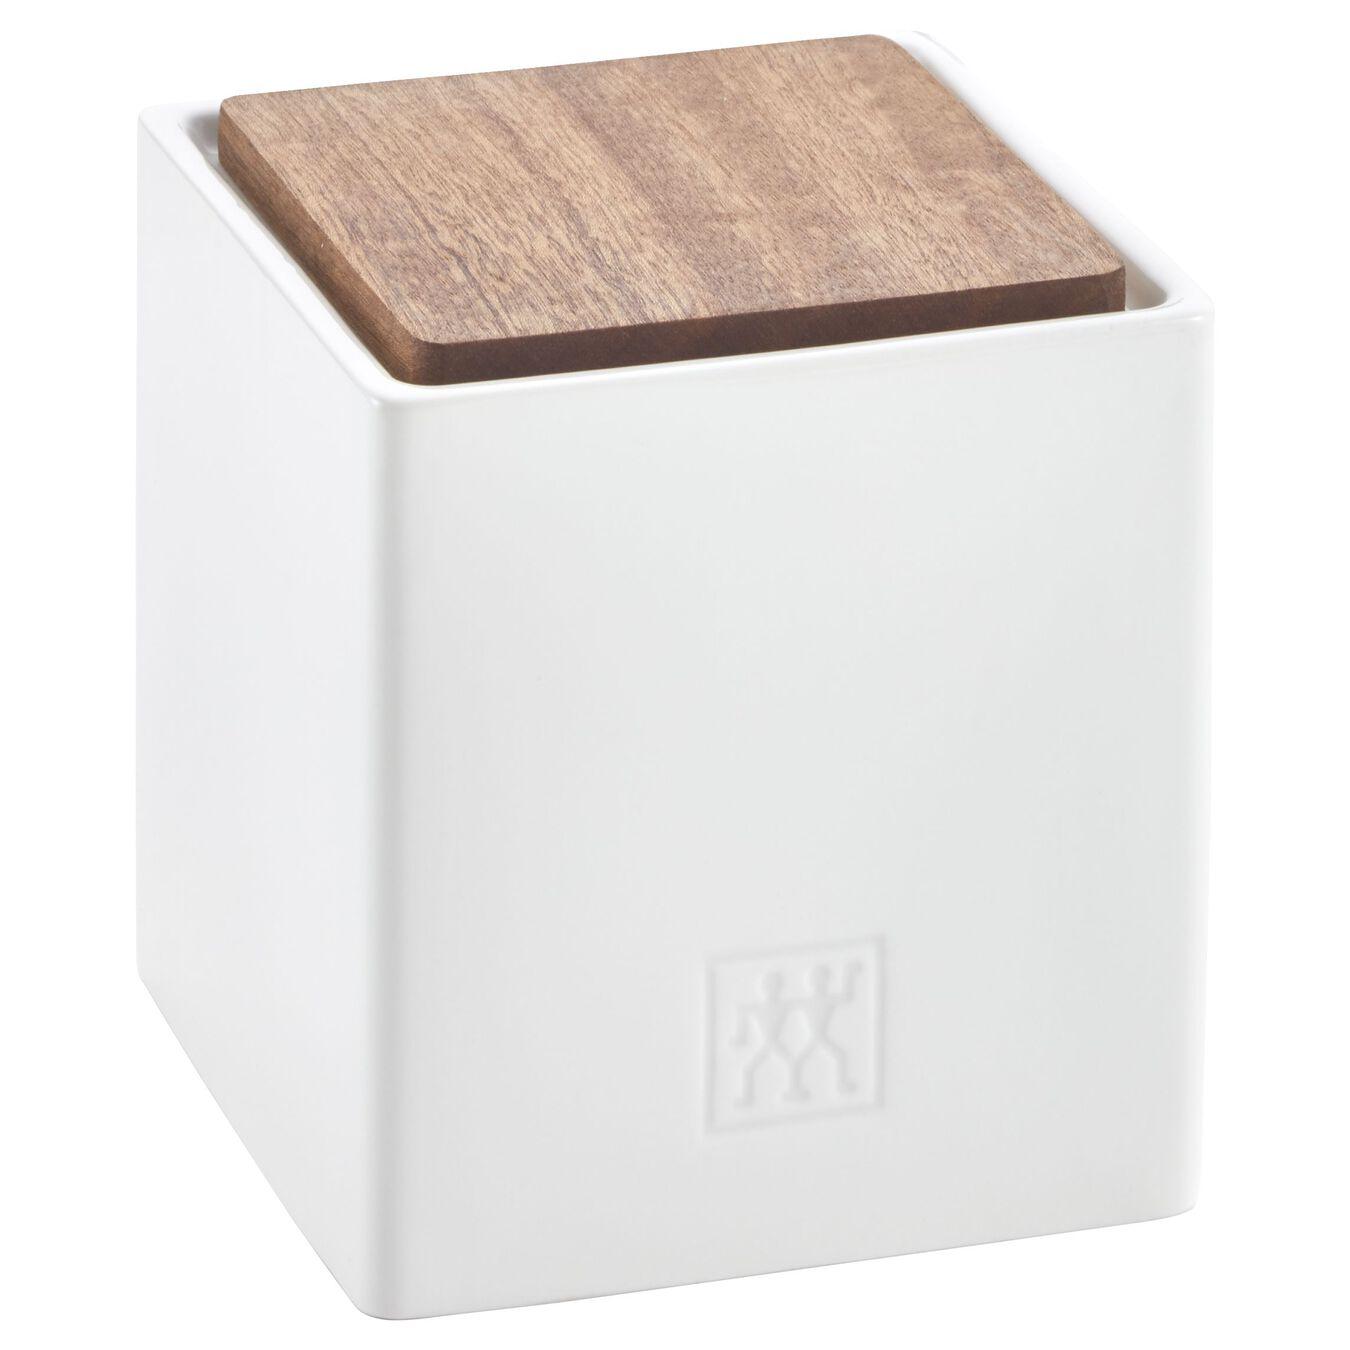 Set ceppo verticale quadrato - 4-pz., ceramica,,large 7